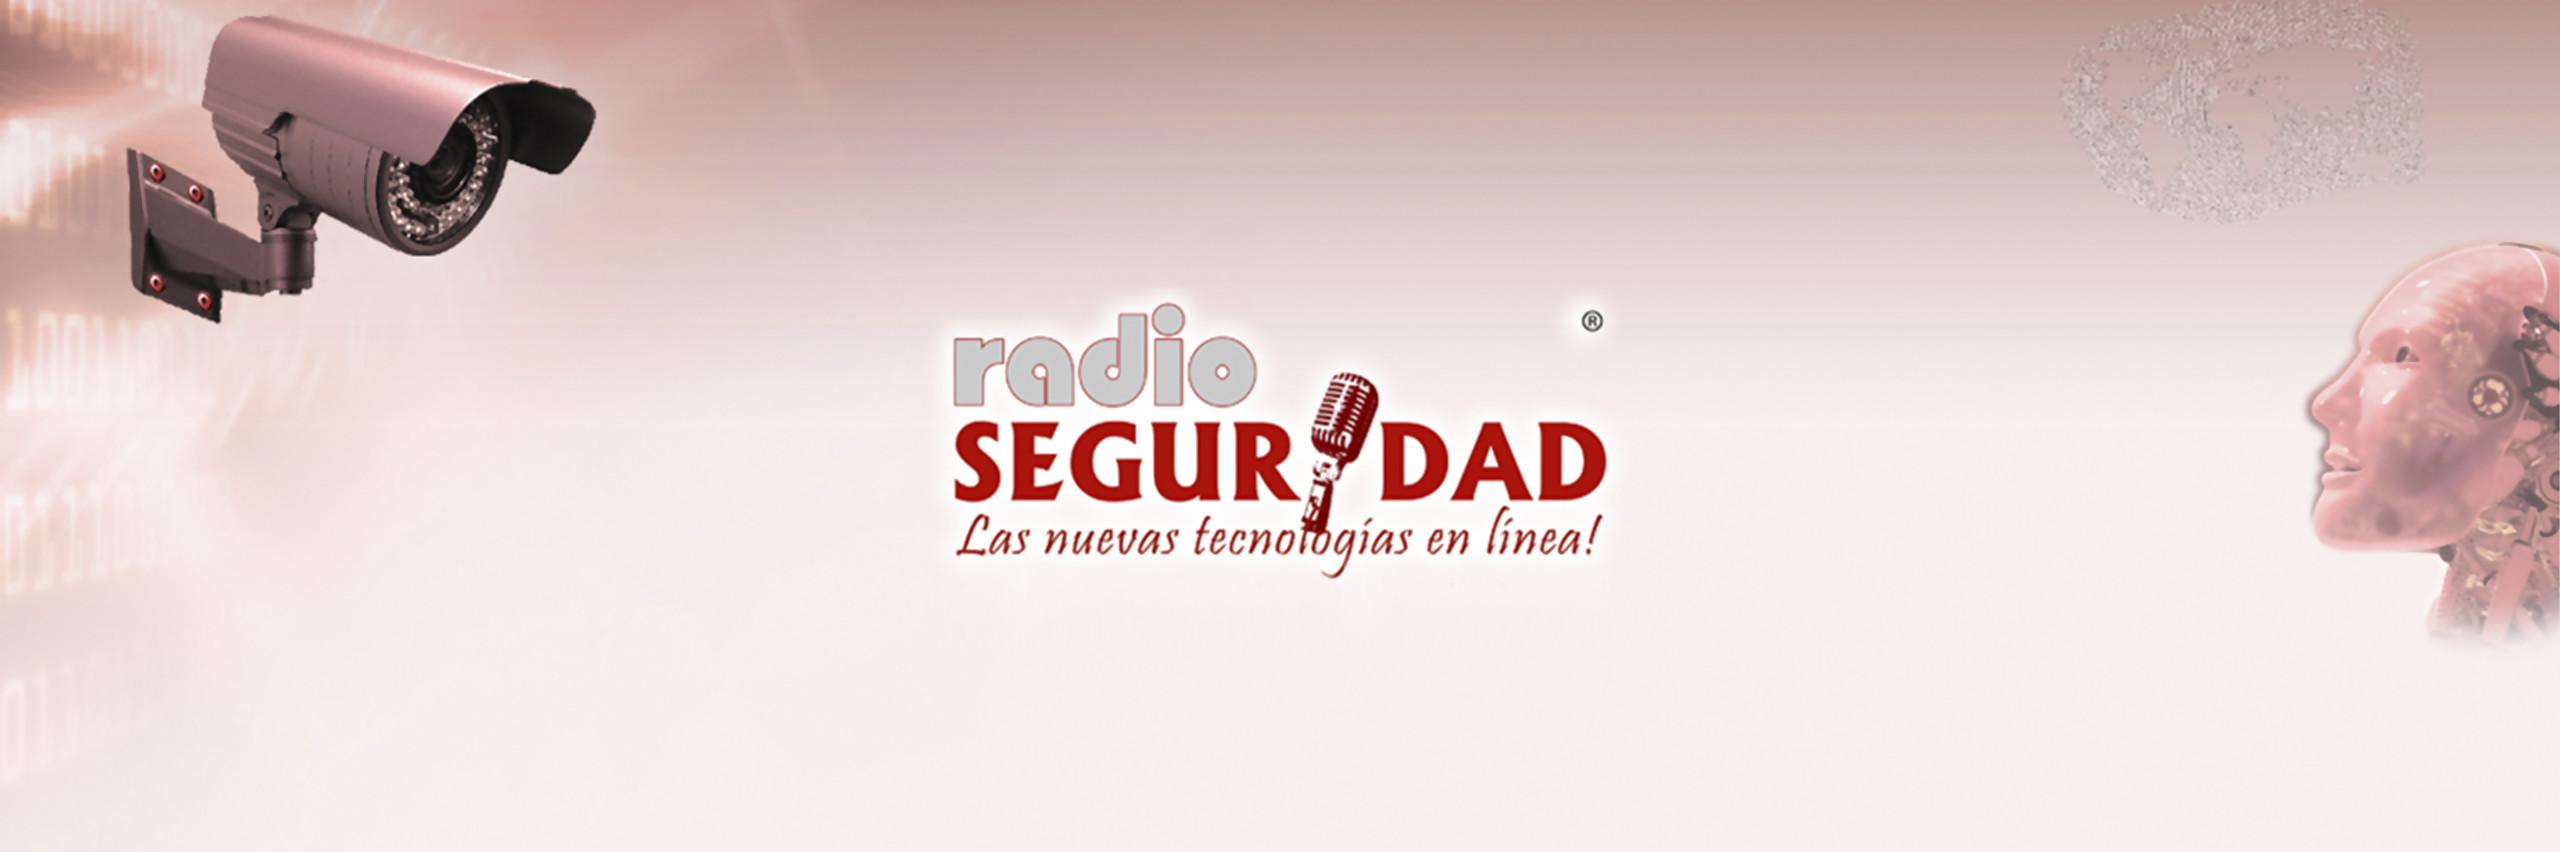 Radio Seguridad